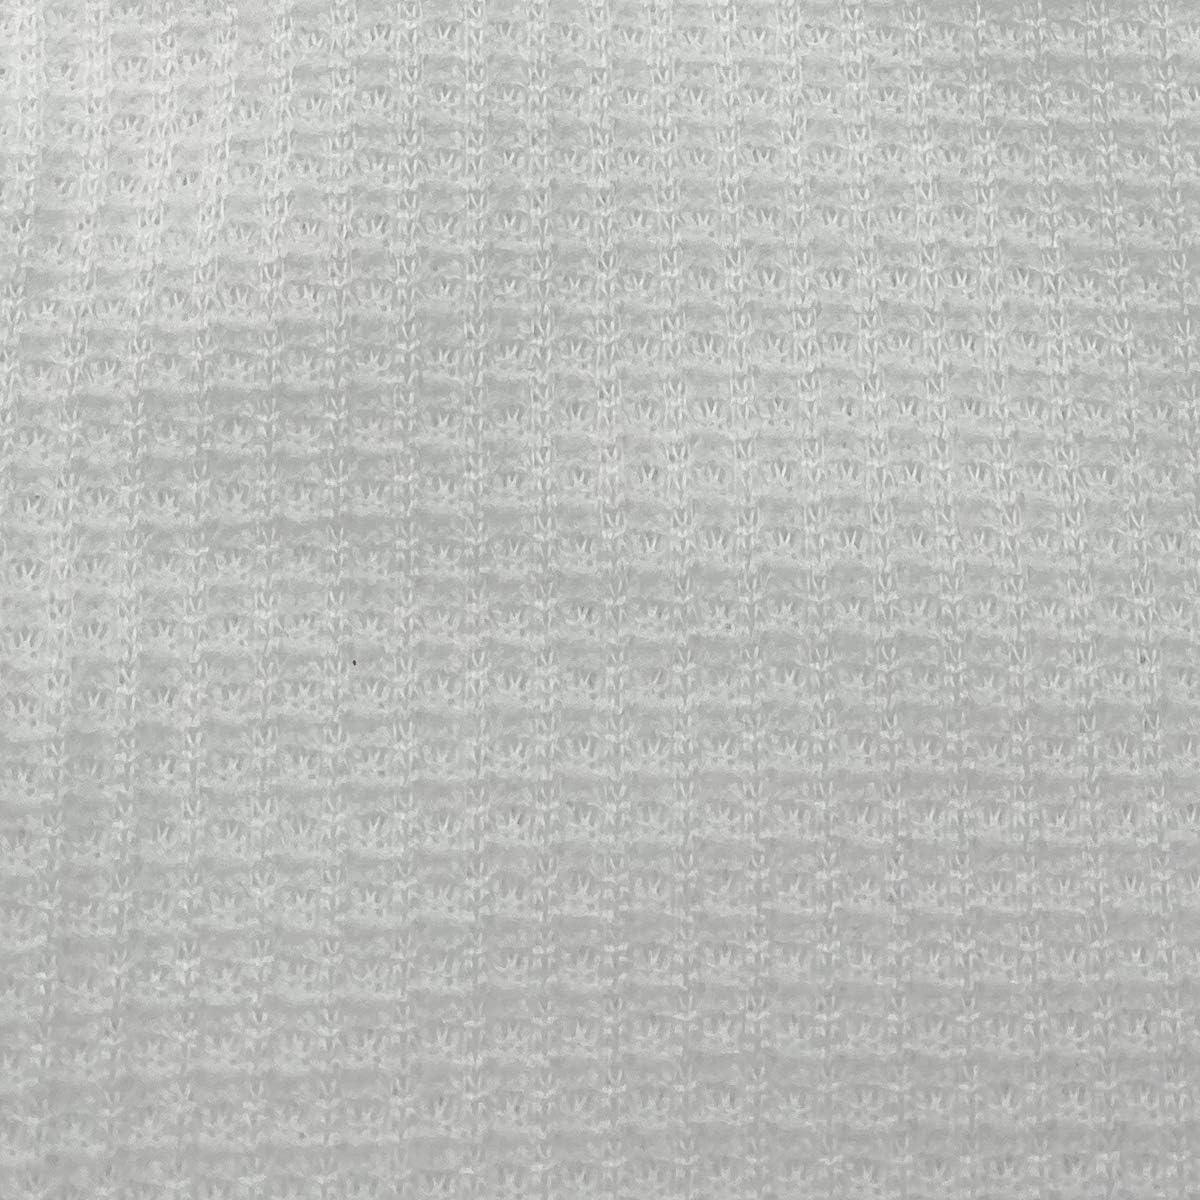 Boys 2pc Cotton Thermal Underwear Set Long Johns Waffle Knit Top Bottom Warm (White)